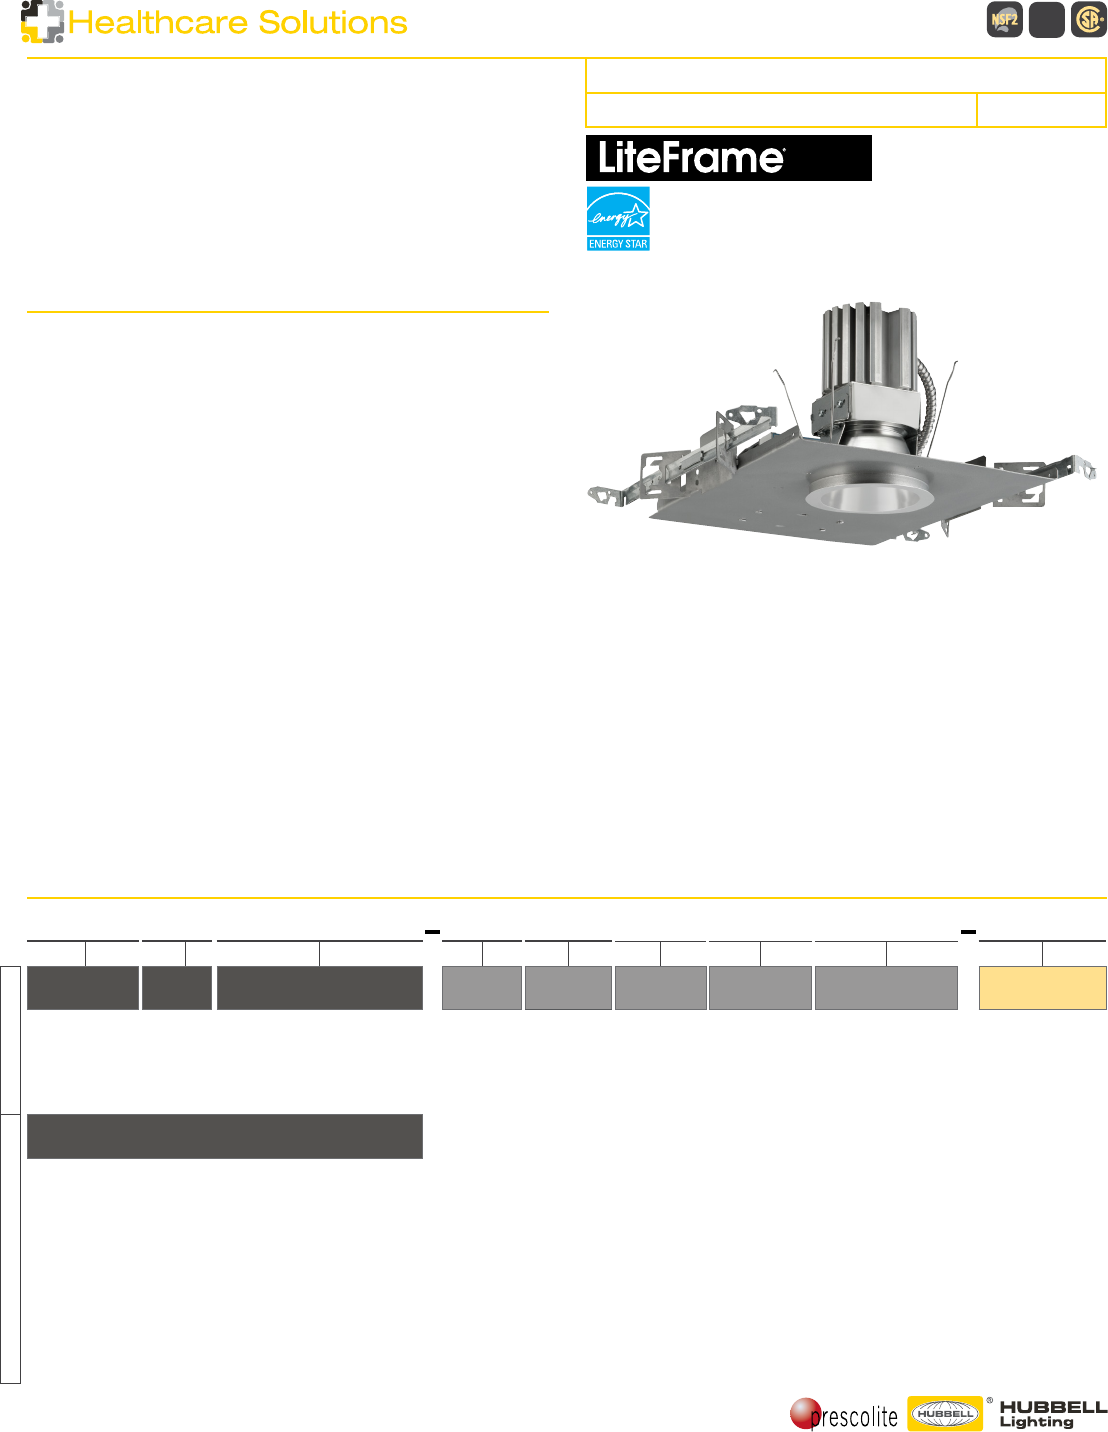 Hcs Lf4ledg4 Nsf2 Spec 16 Dimmer Diagrams Advance Wiring Xi025c100v036dnm1 17 Products Hubbellhealthcare Epsgprod 3